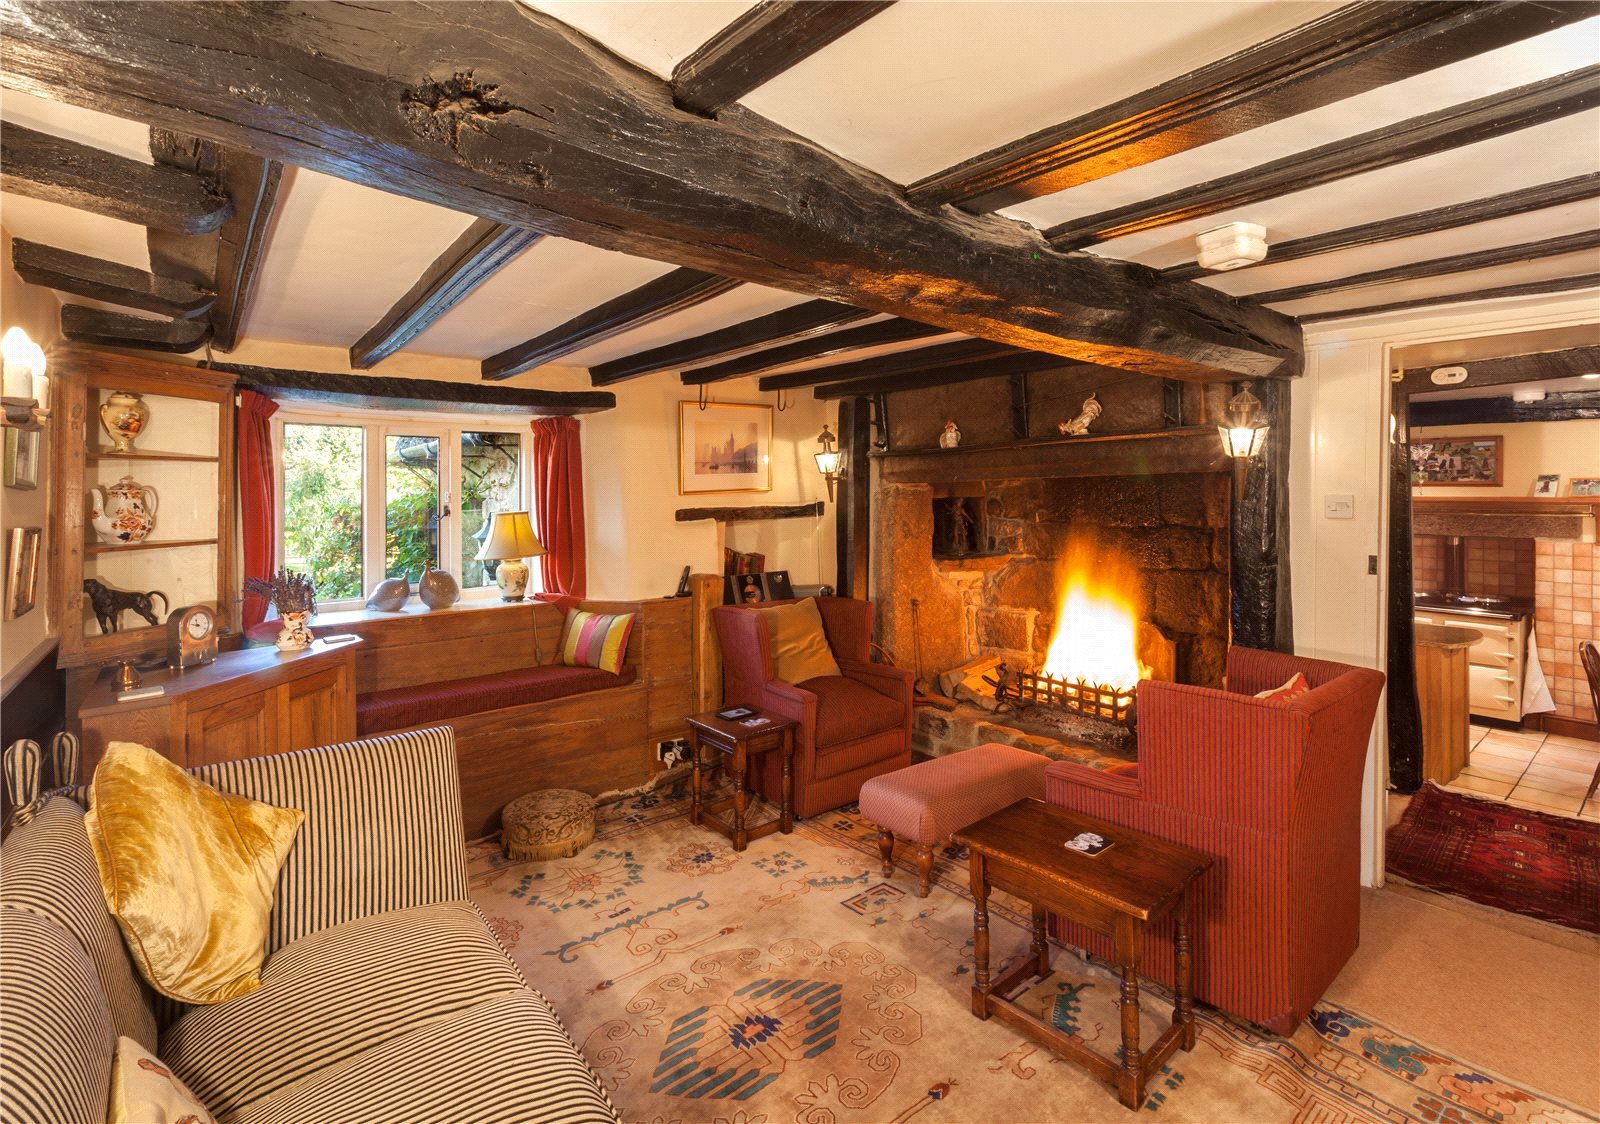 Casa Unifamiliar por un Venta en Chagford, Newton Abbot, Devon, TQ13 Newton Abbot, Inglaterra